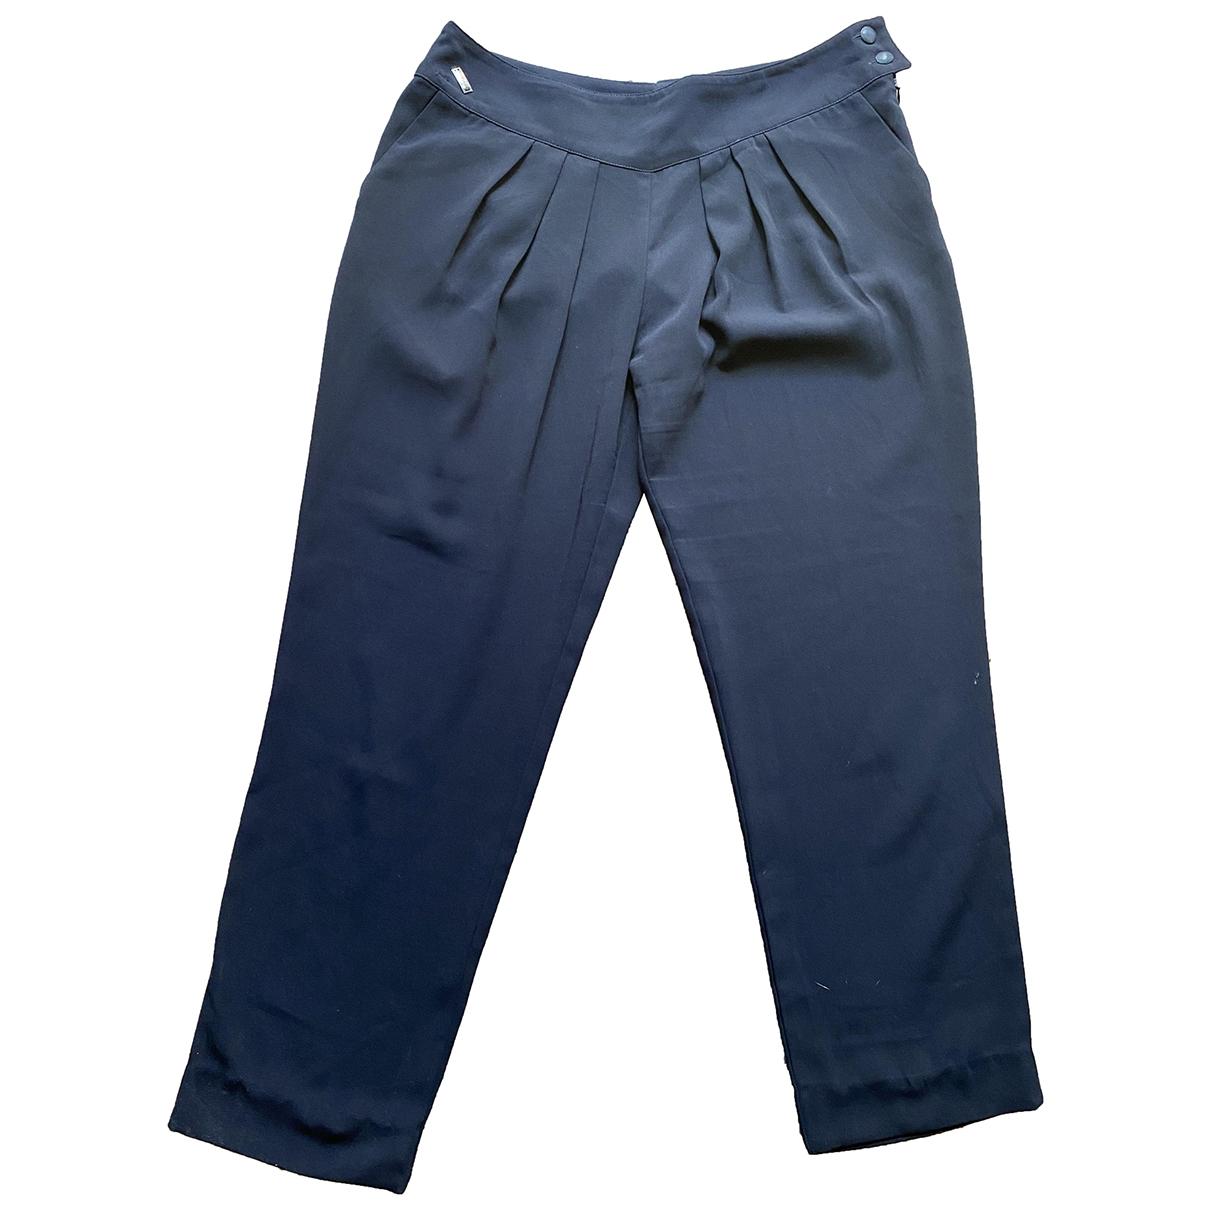 Pantalon corto Cop Copine